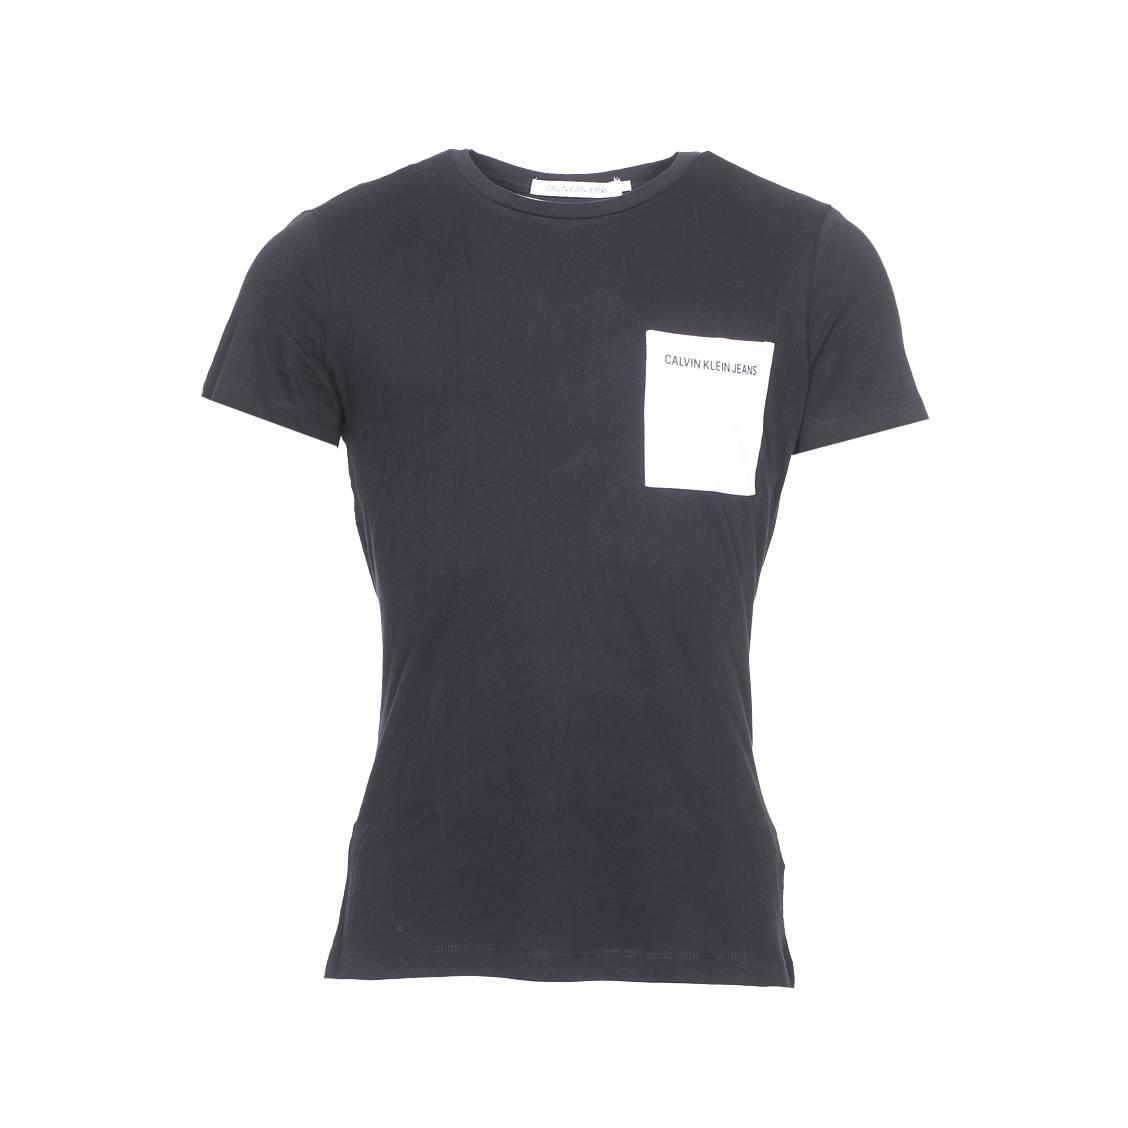 Tee-shirt col rond  pocket institutional logo slim en coton noir à poche poitrine